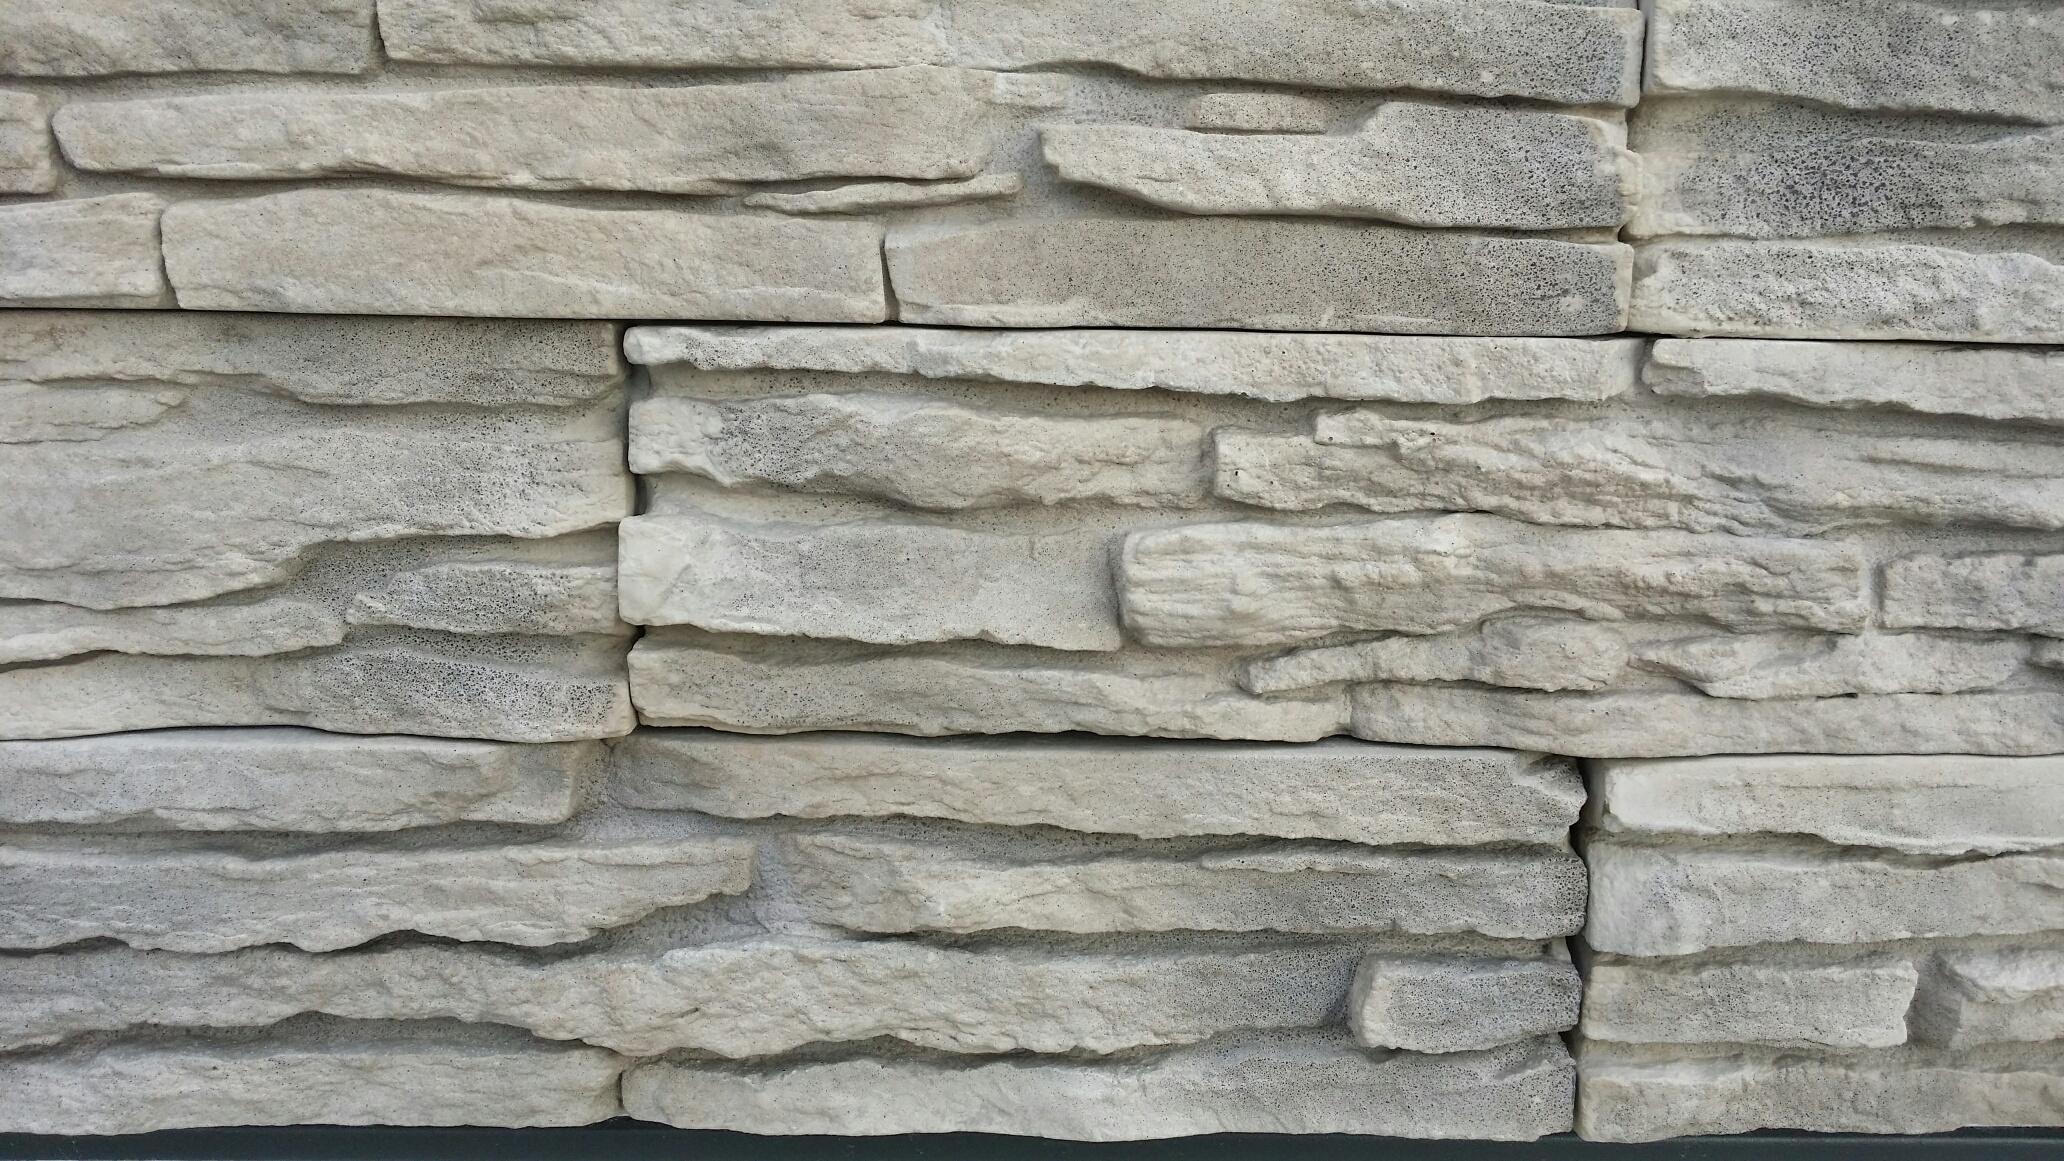 Pietra ricostruita   pietre raffaele cileo   pietra di trani ...